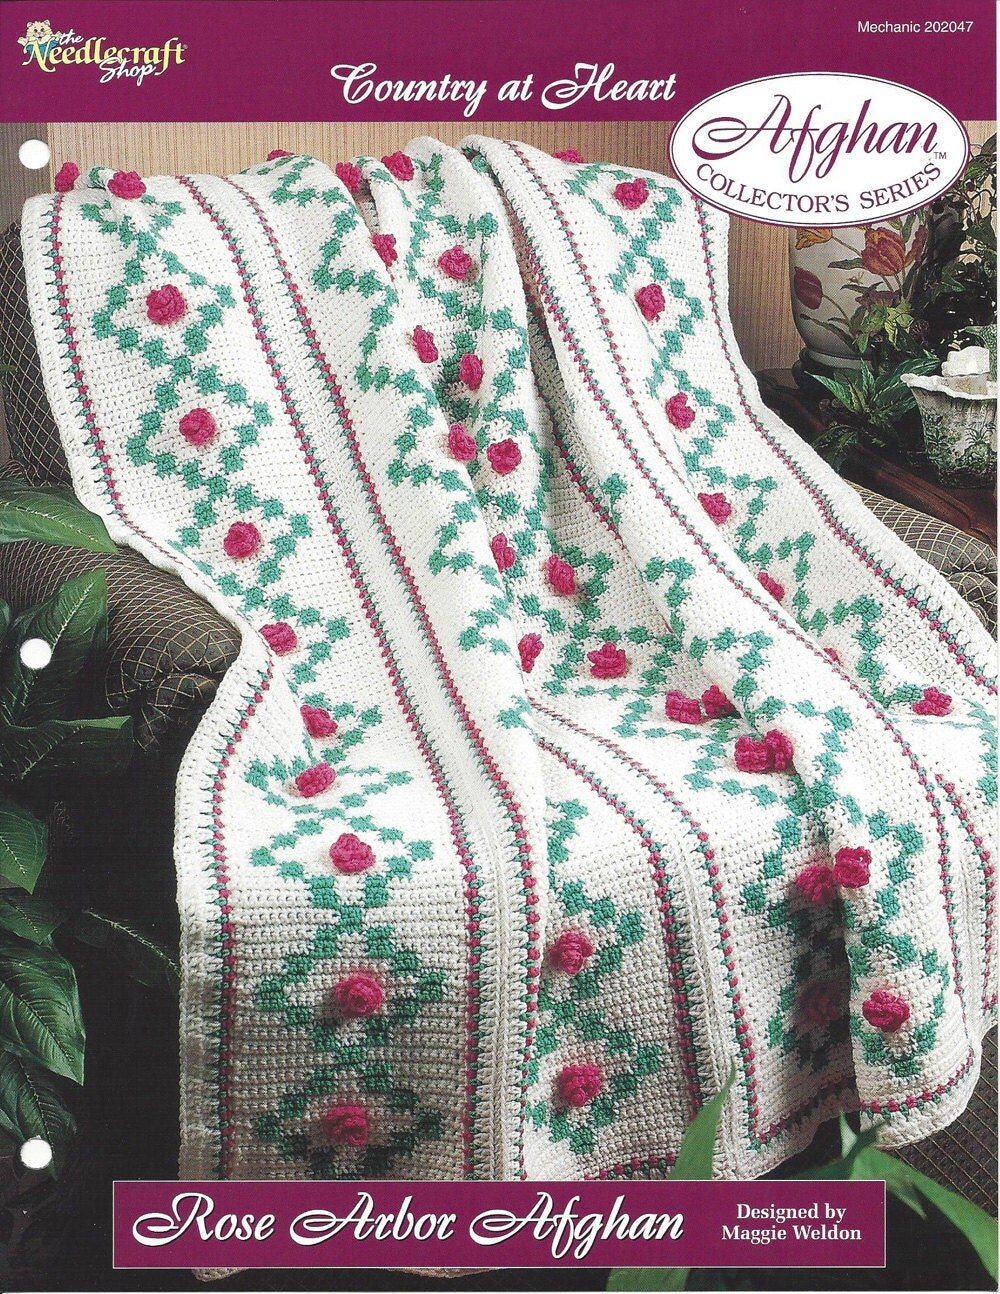 Rose Arbor Afghan Crochet Pattern Afghan Collectors Series The